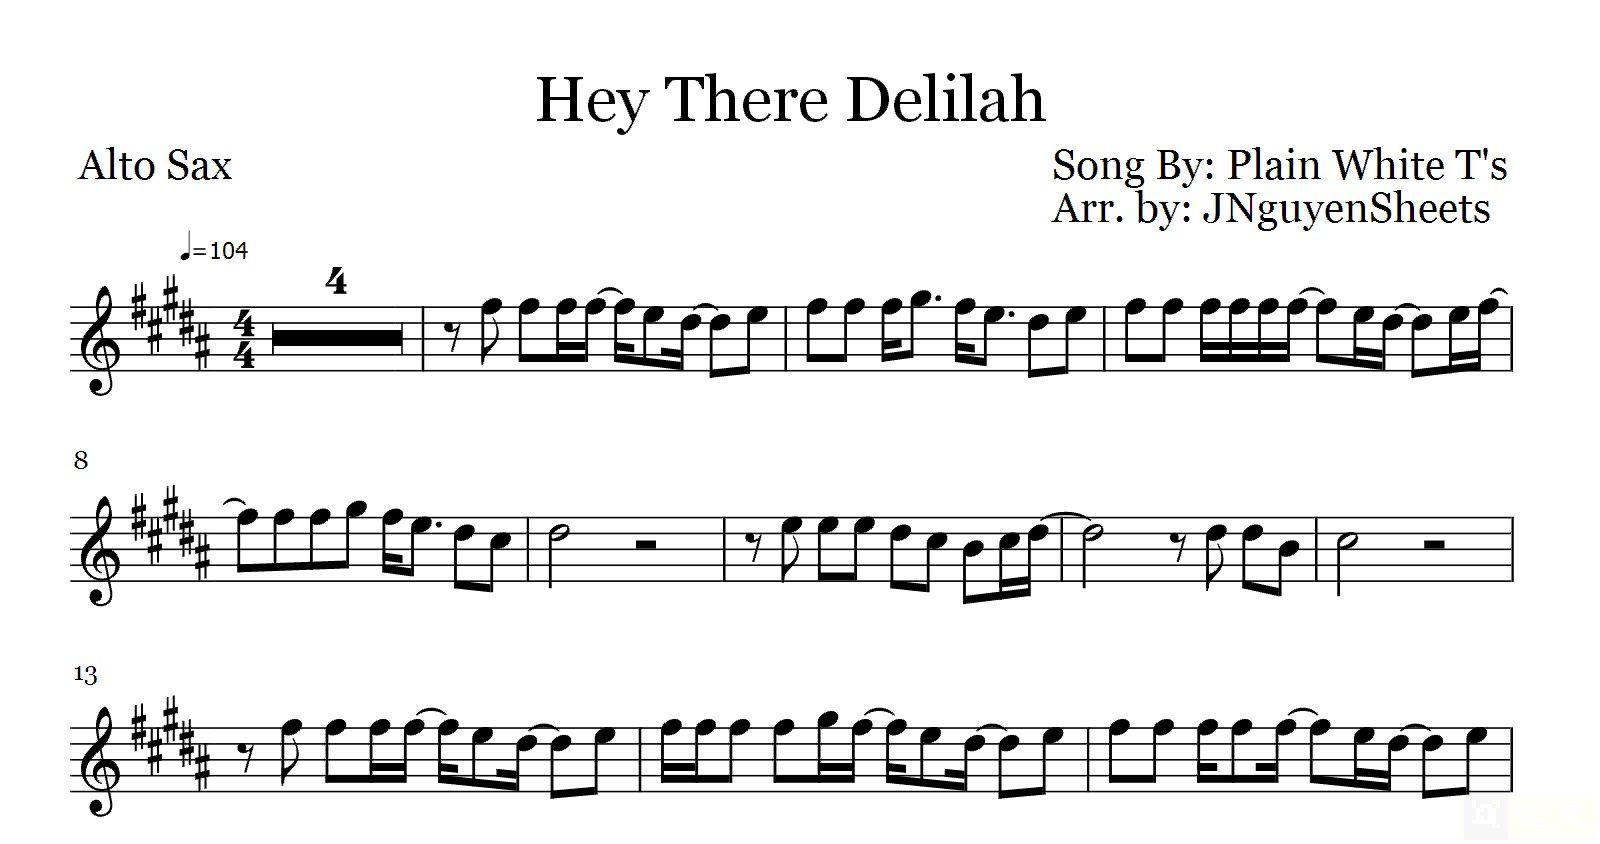 Hey there delilah plain white ts saxophone sheet music